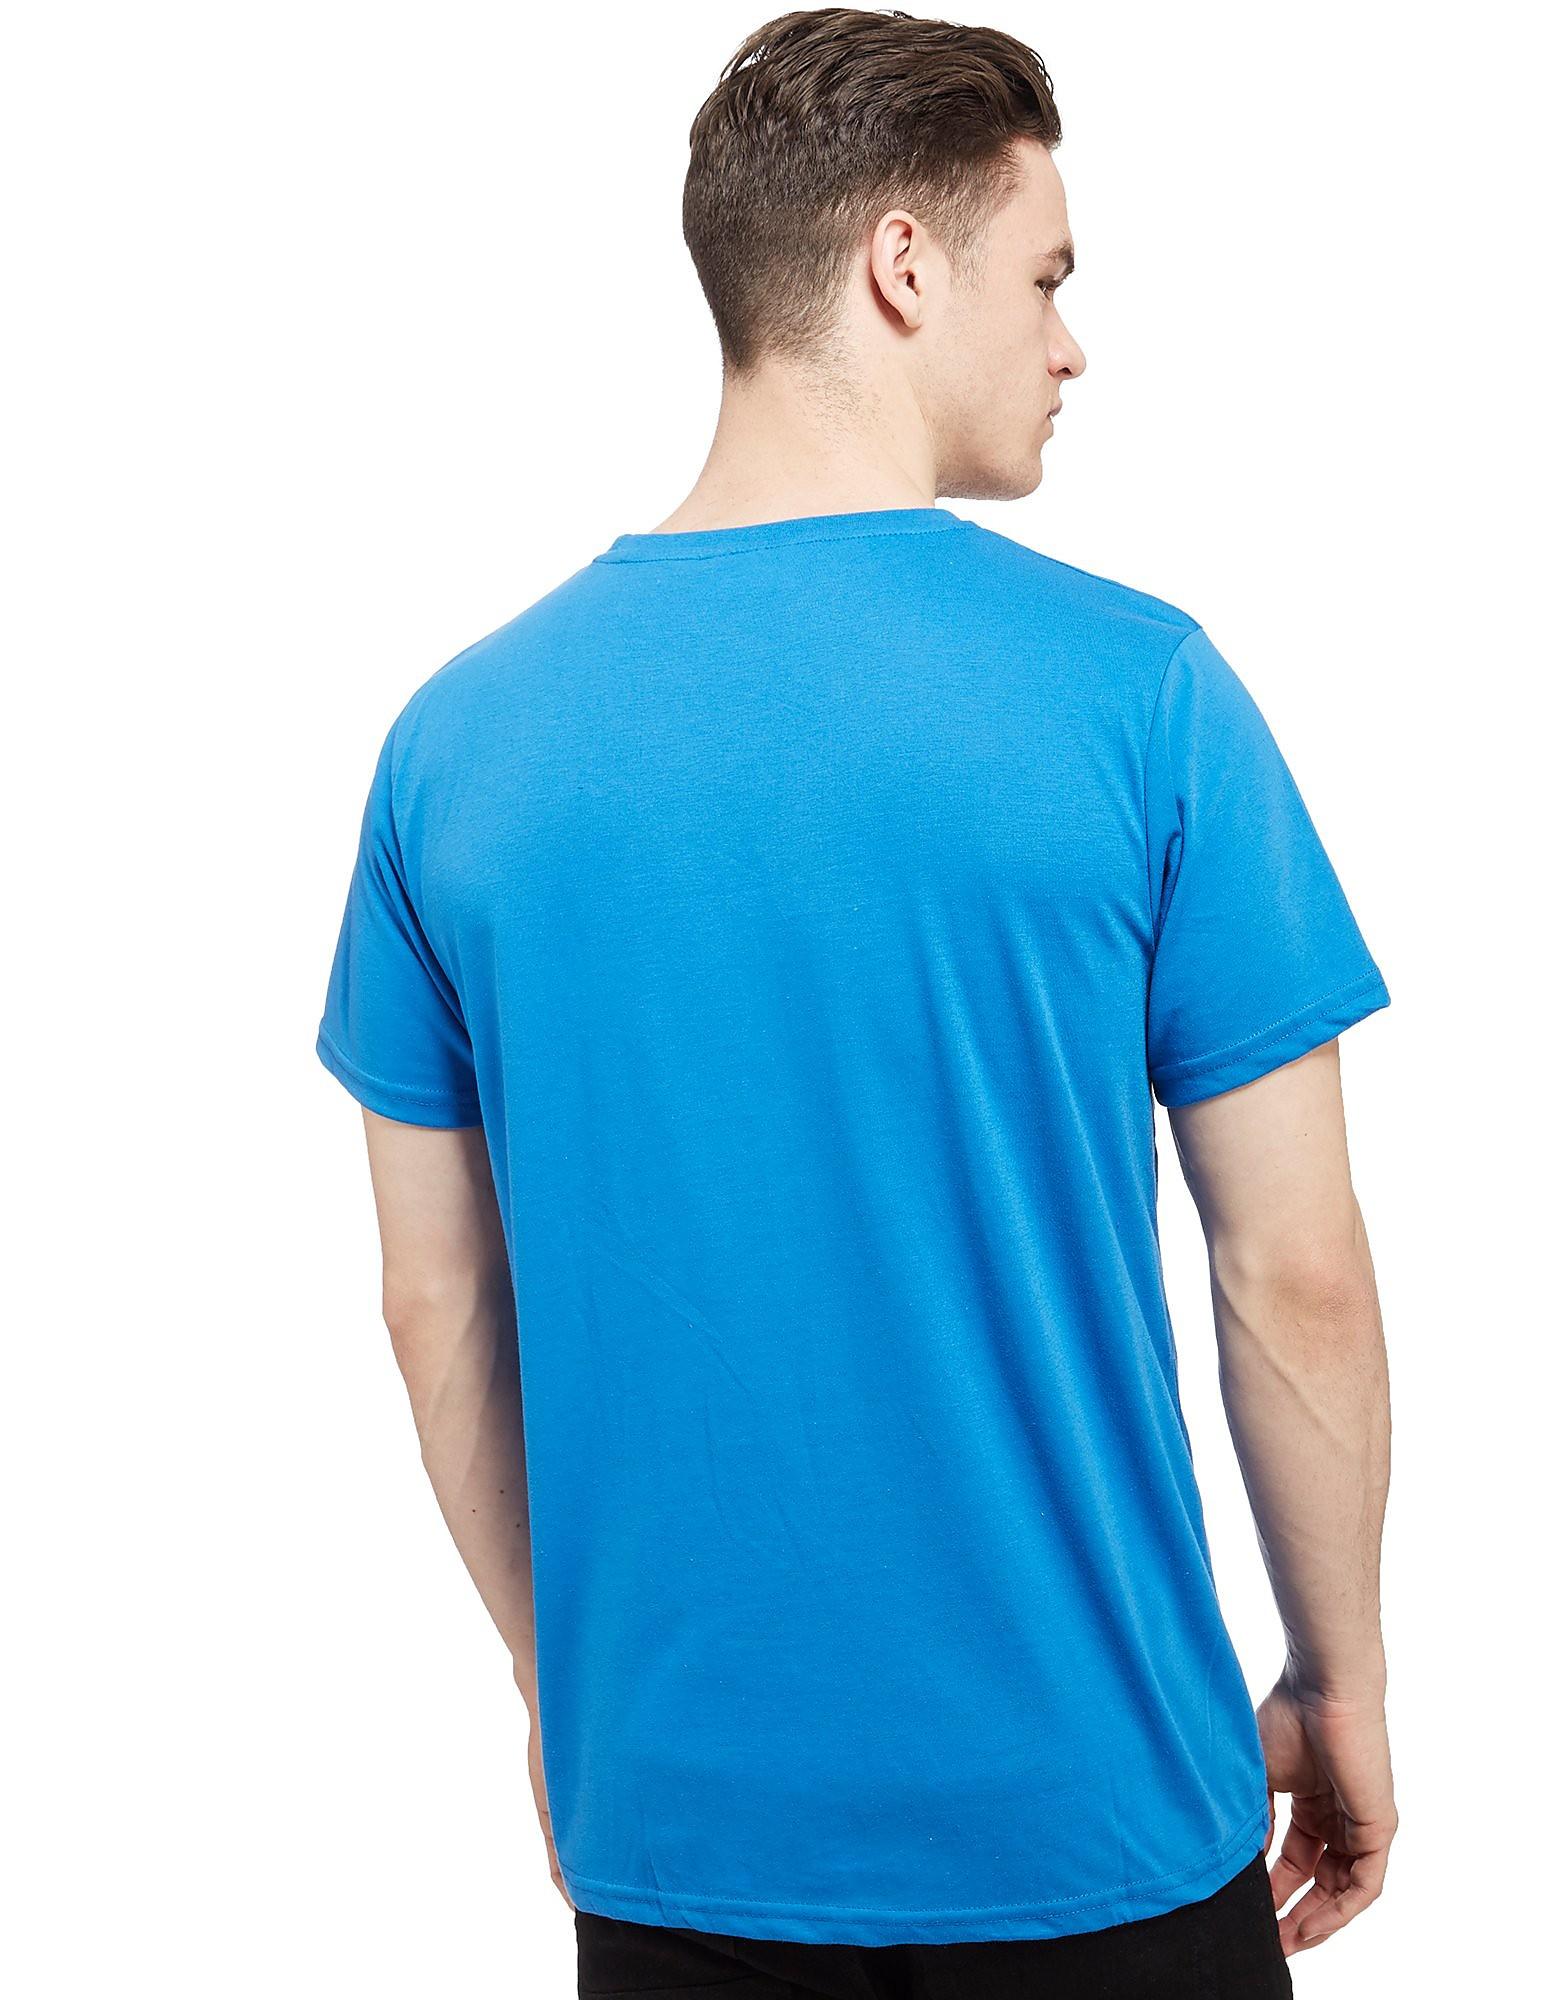 Sergio Tacchini Carleton T-Shirt